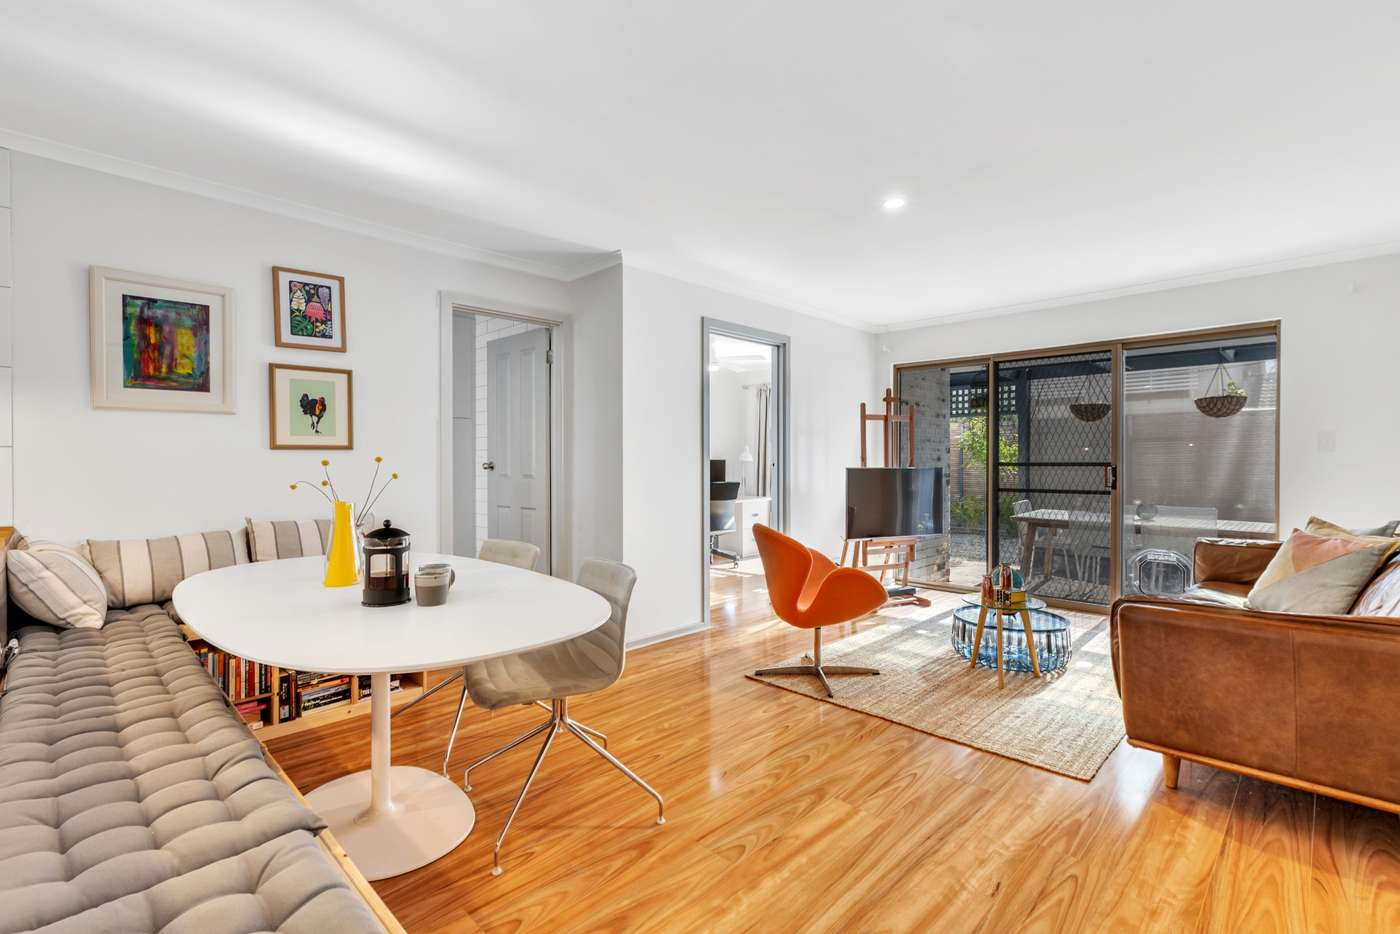 Main view of Homely house listing, 4 Borroughs Street, Ridleyton SA 5008